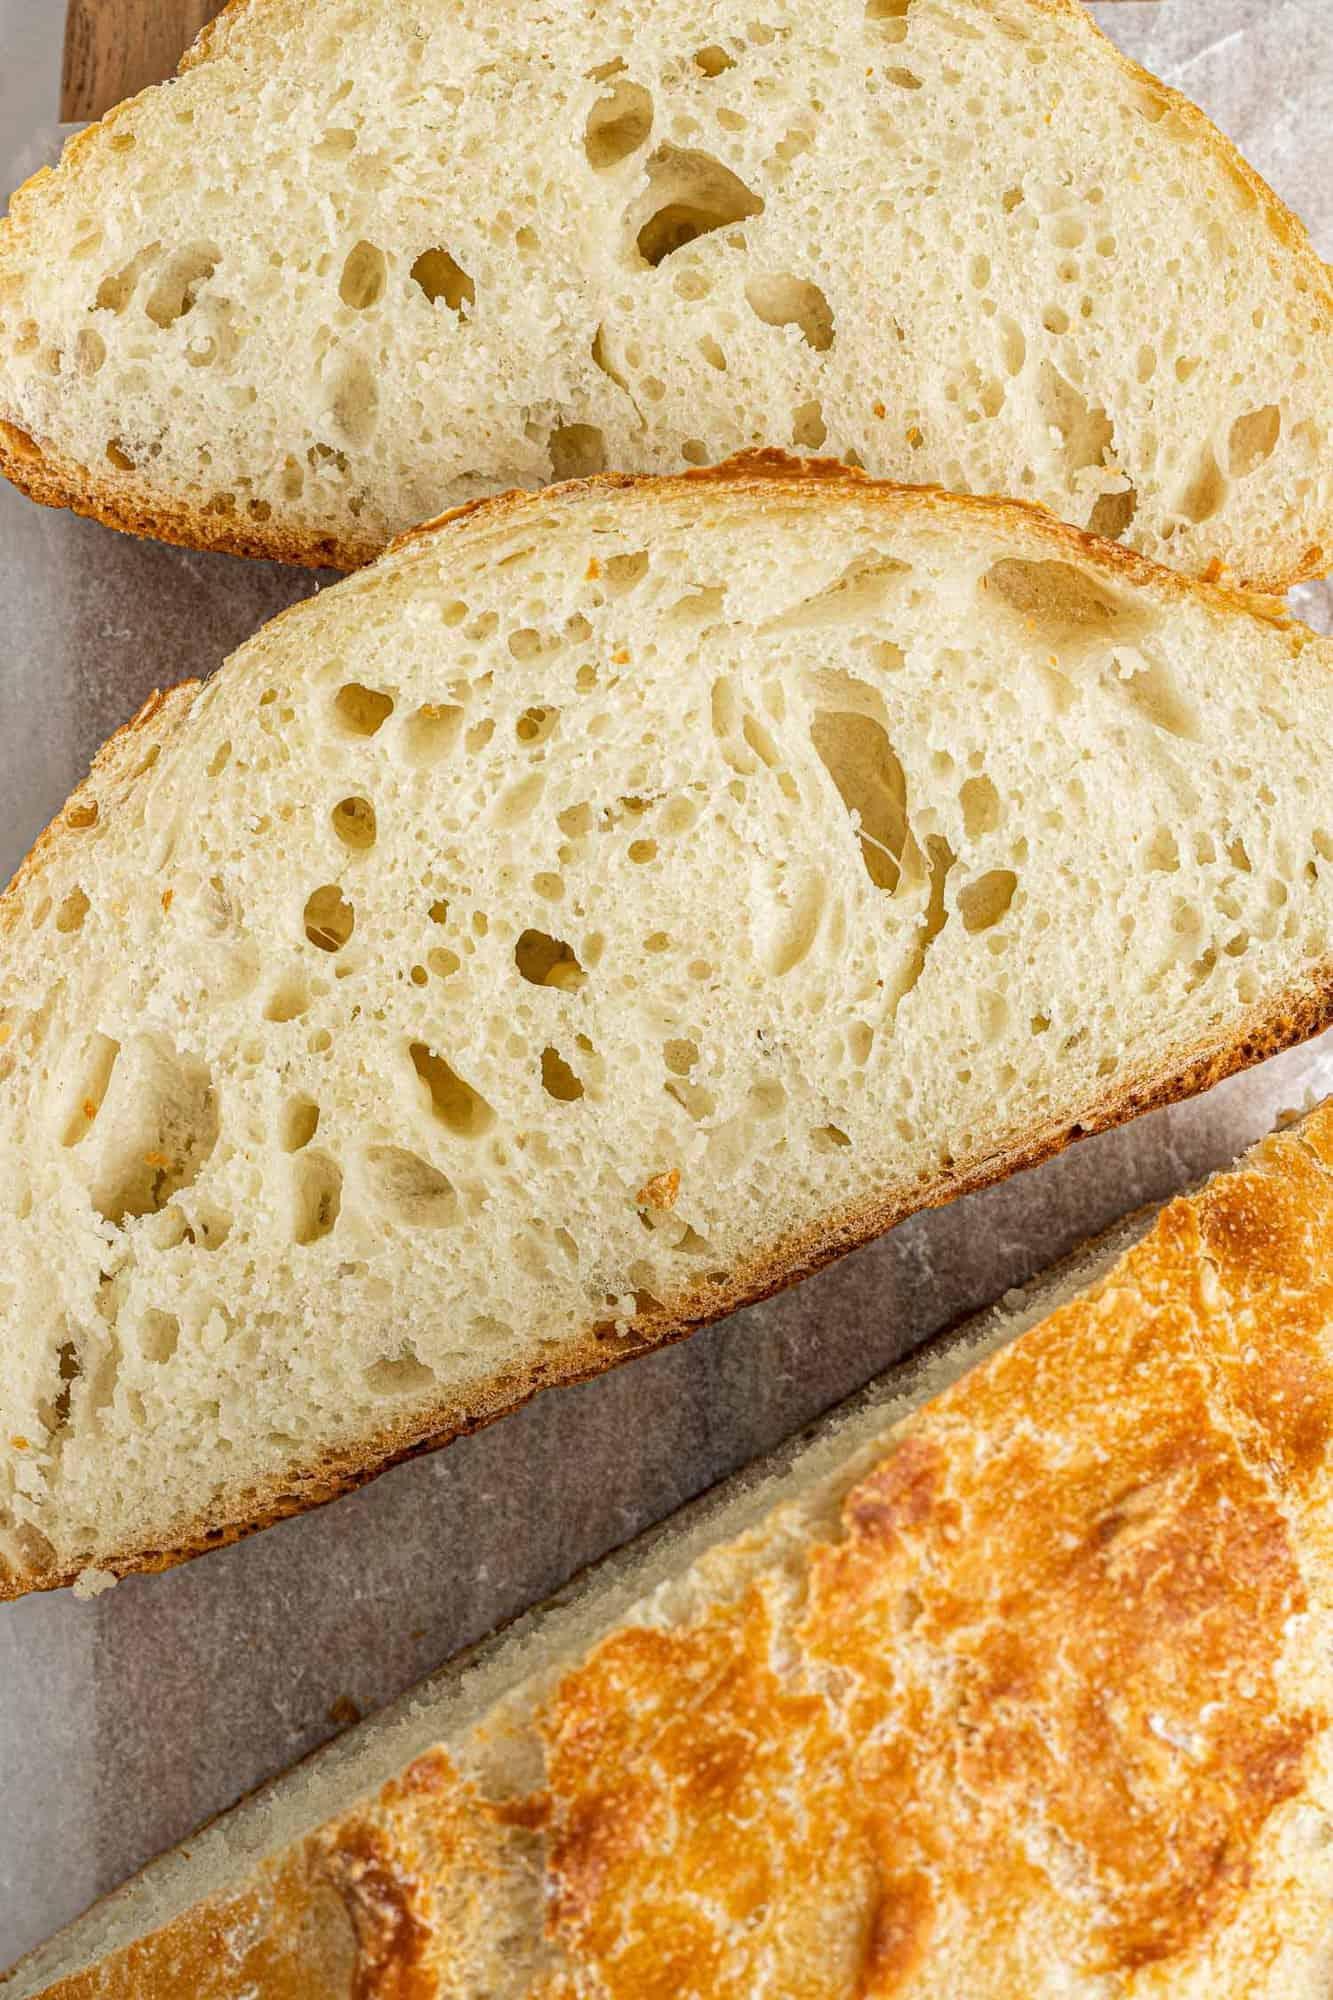 Overhead view of sliced artisan bread.